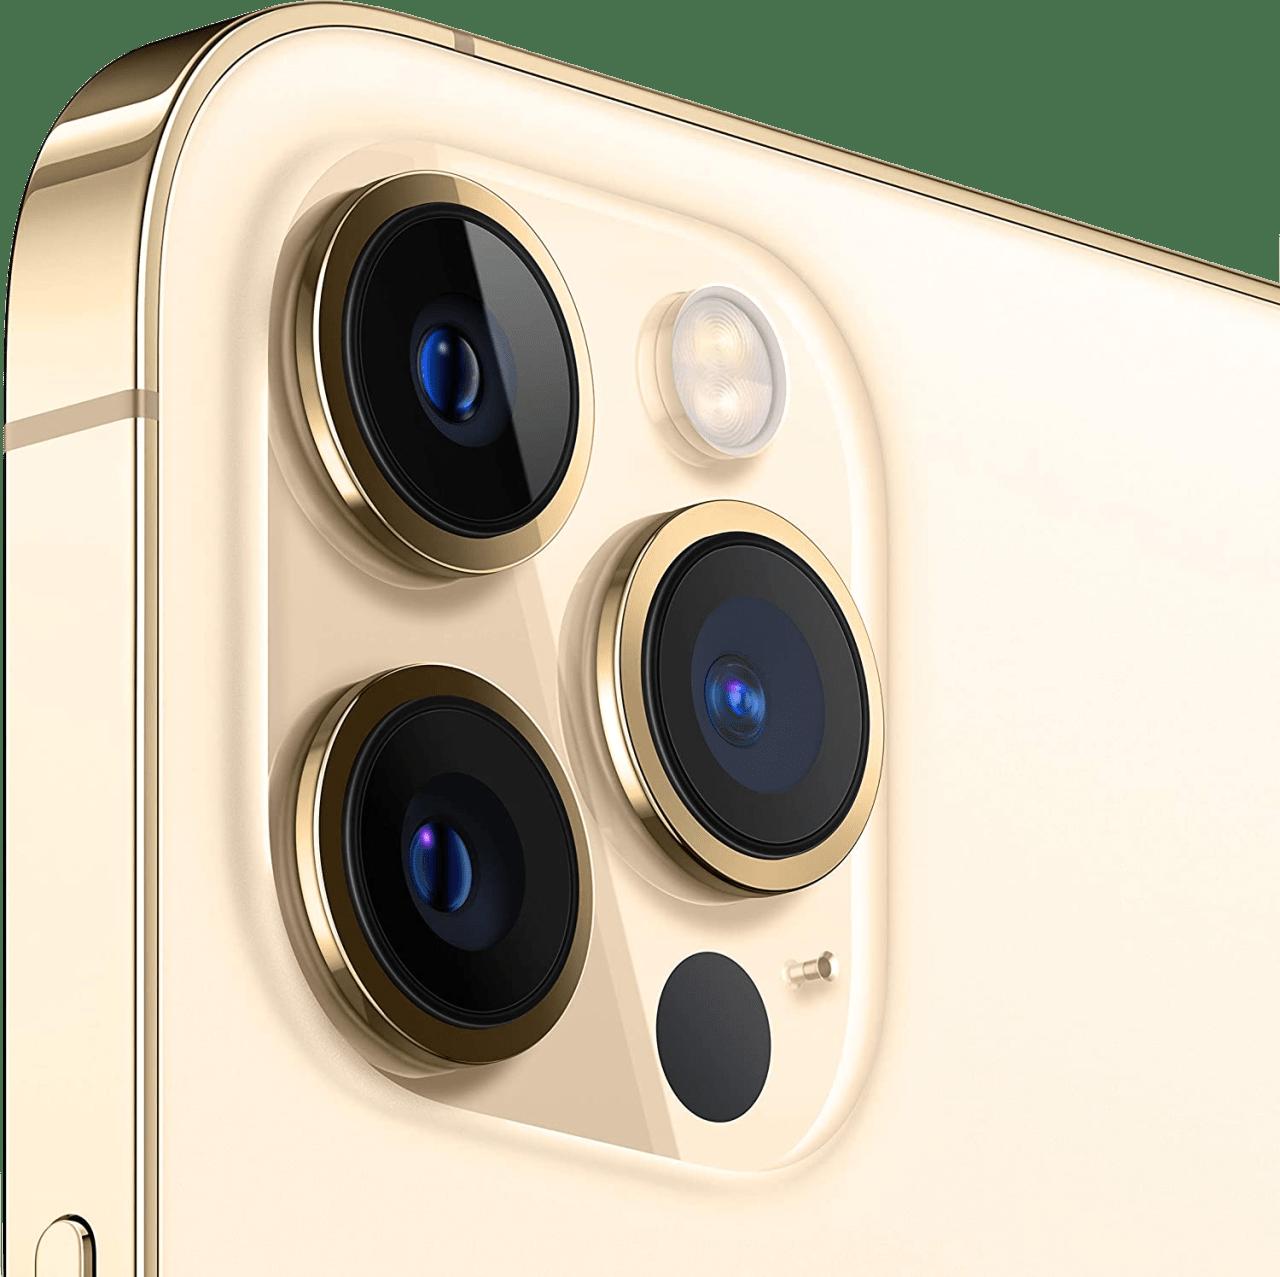 Gold Apple iPhone 12 Pro 256GB.2